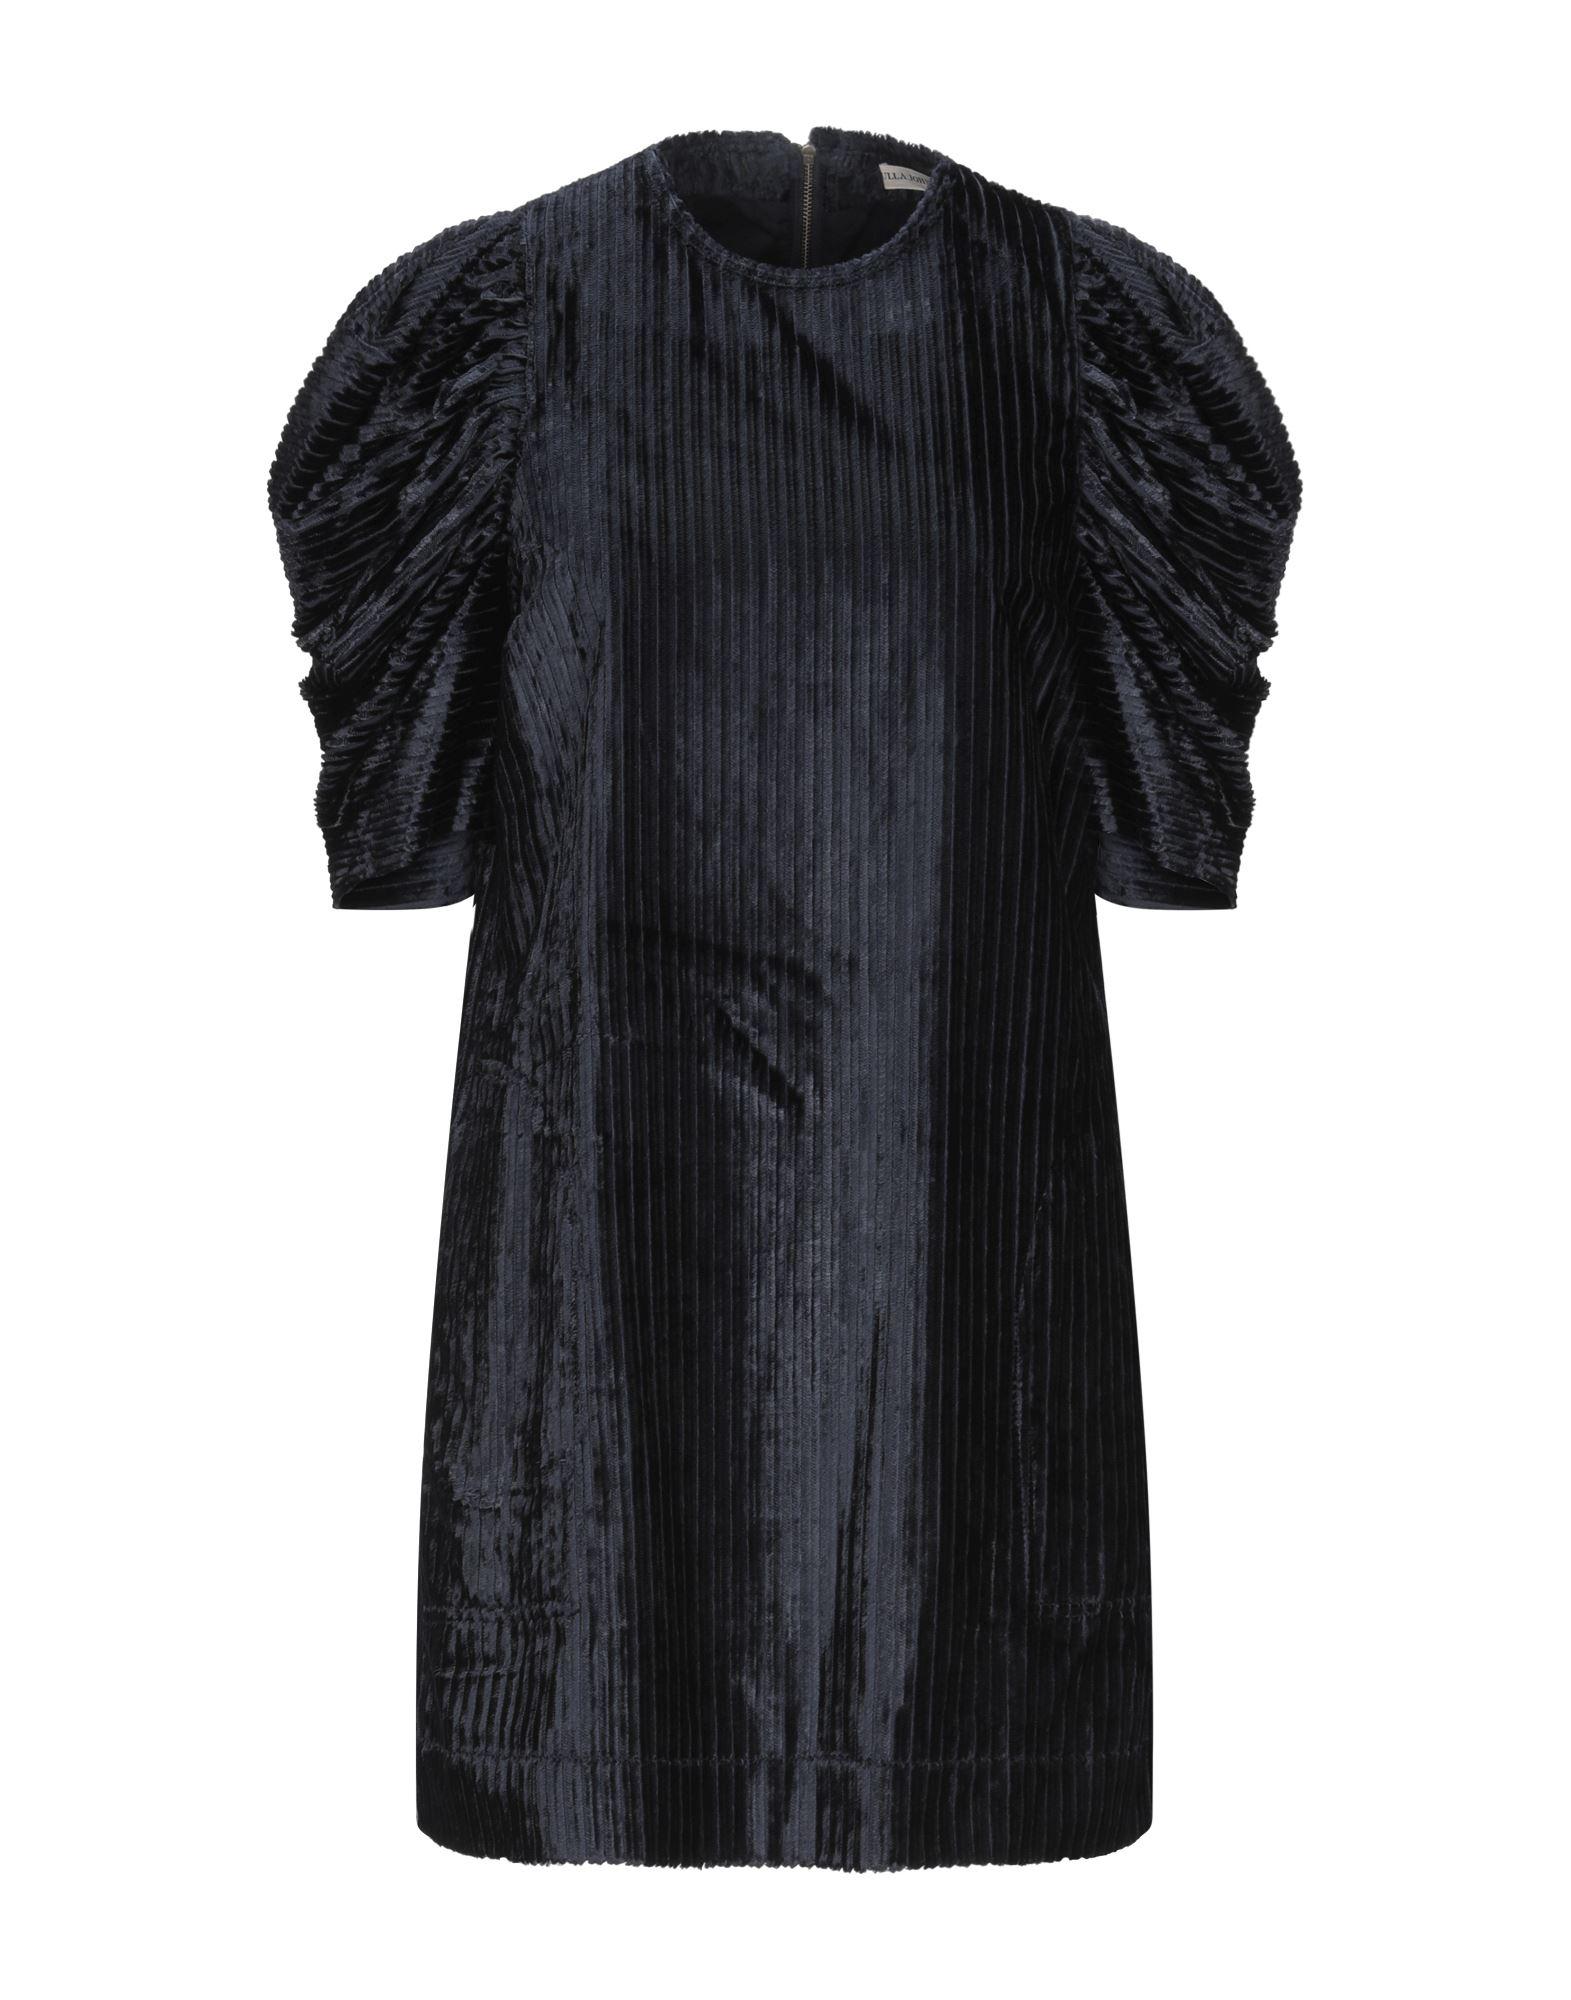 Фото - ULLA JOHNSON Короткое платье ulla johnson платье до колена